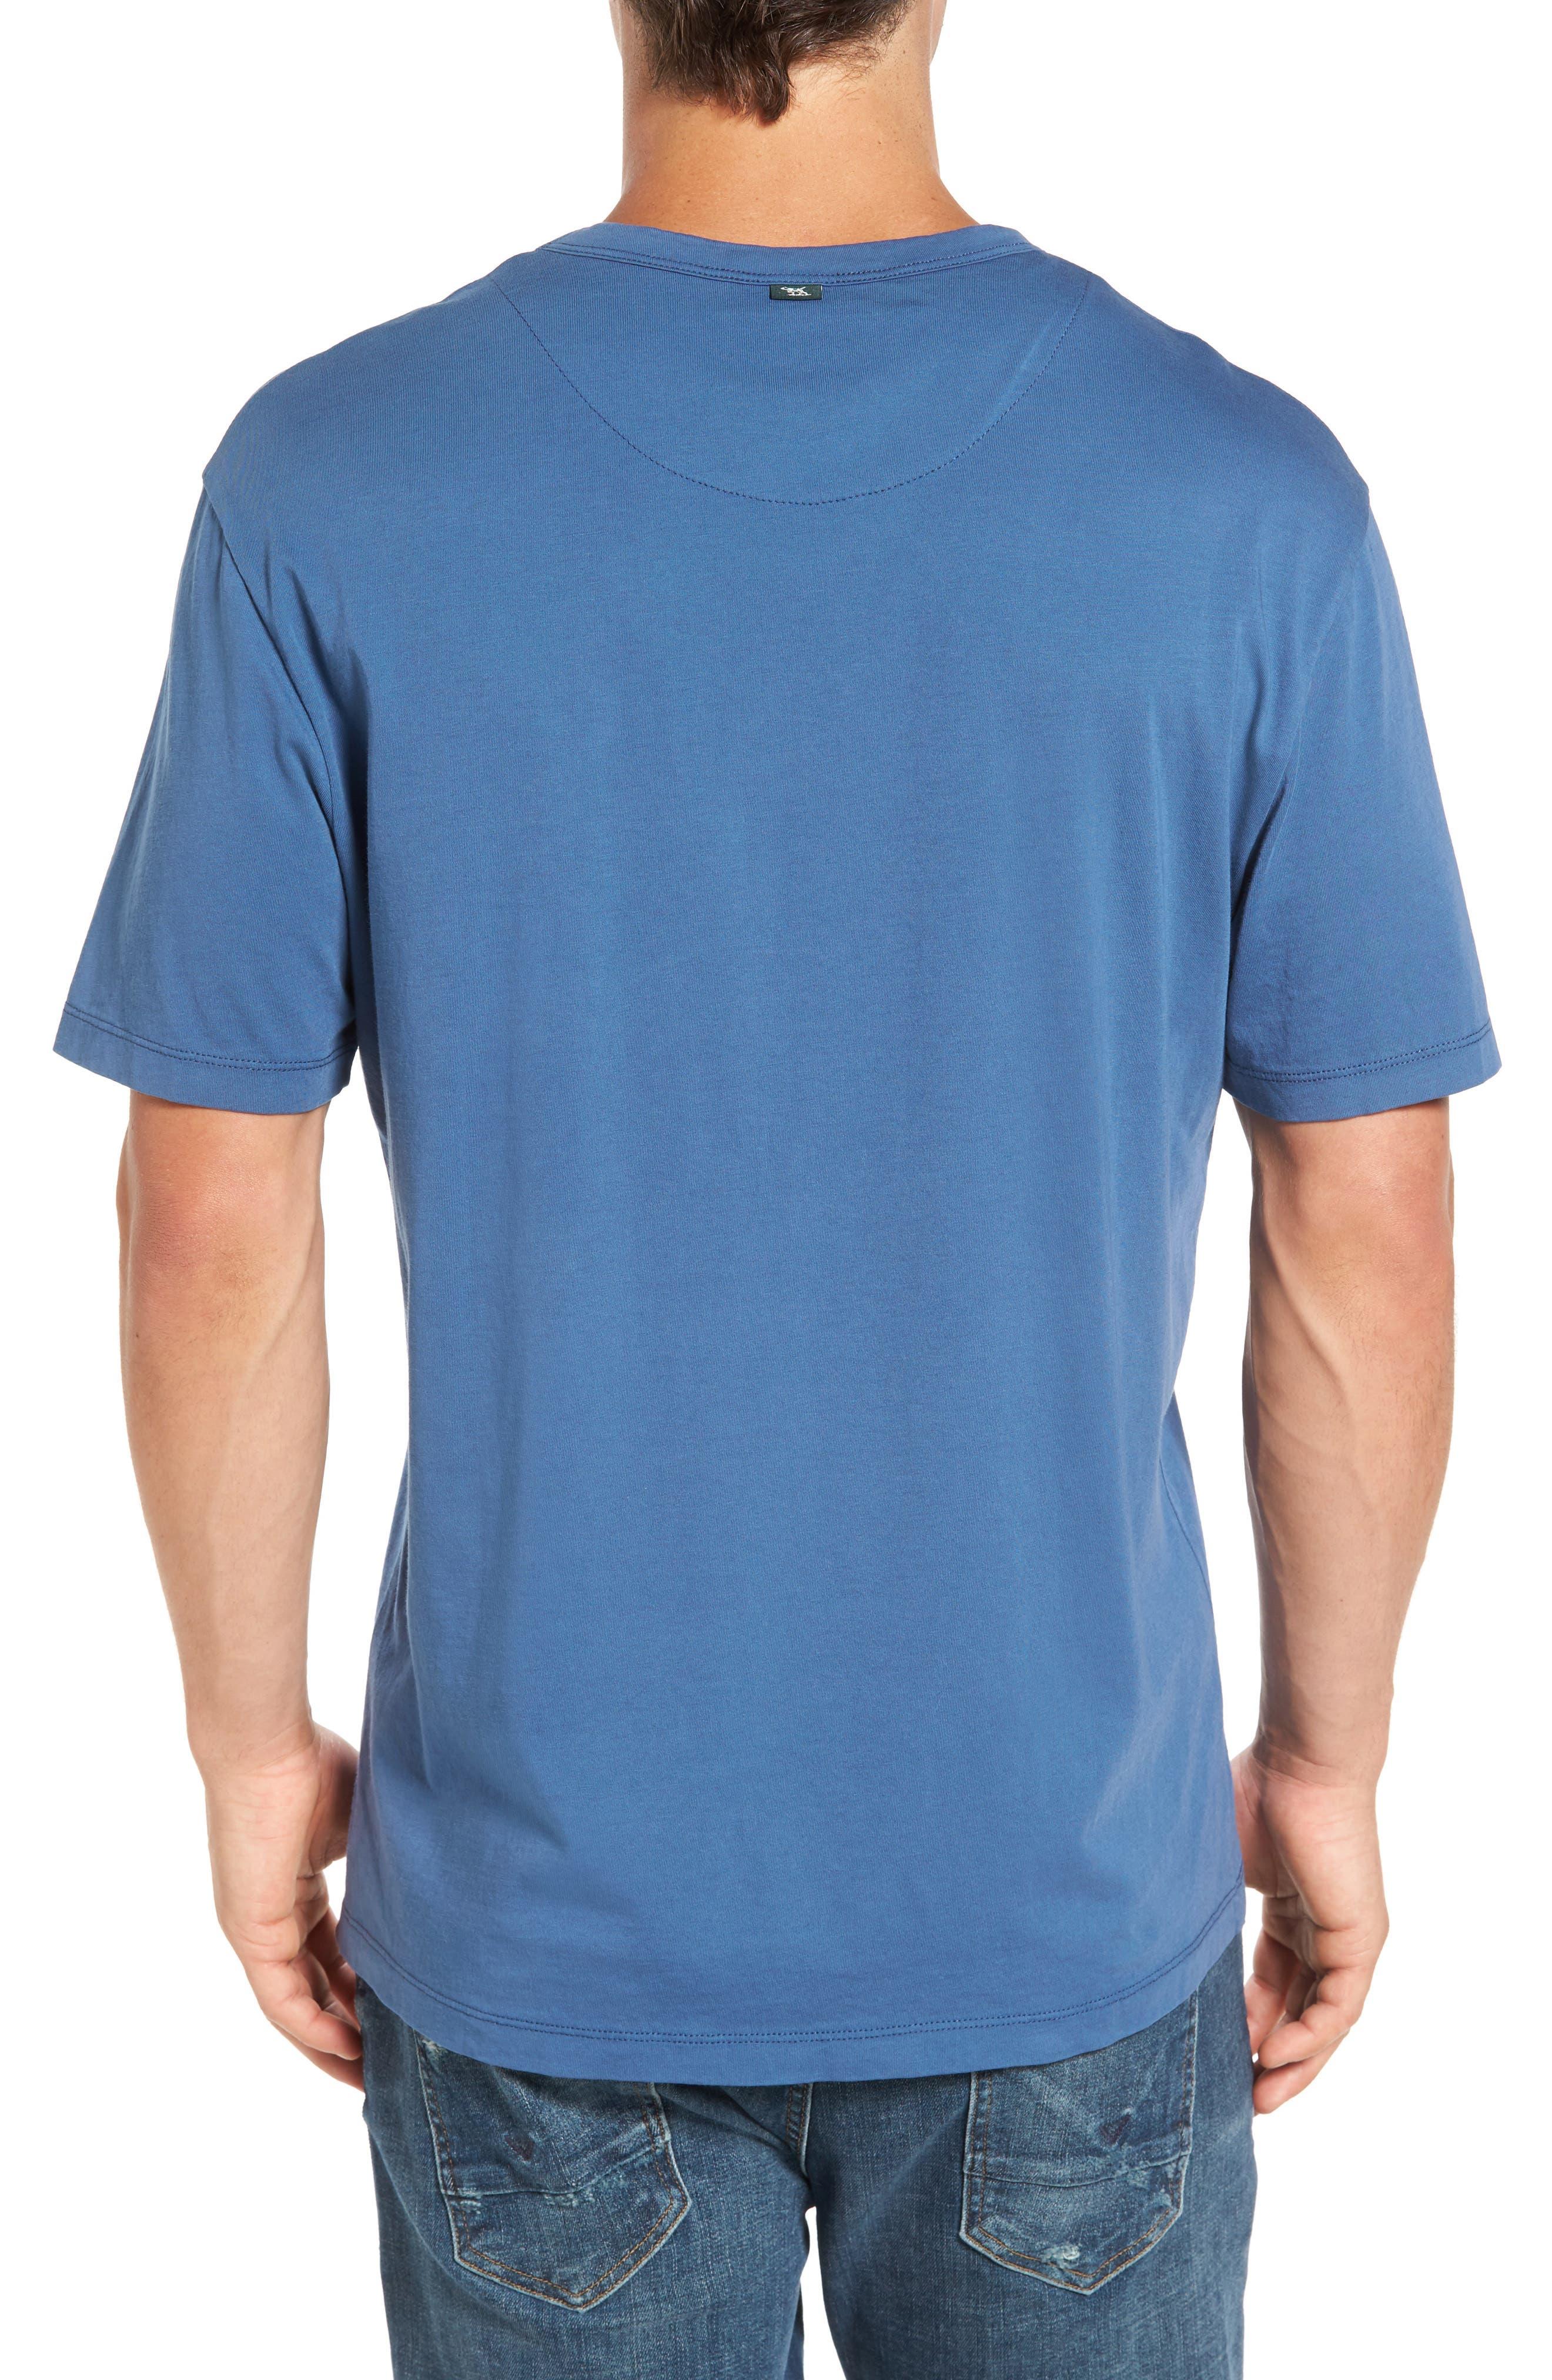 Spinnaker Bay Sports Fit Crewneck T-Shirt,                             Alternate thumbnail 7, color,